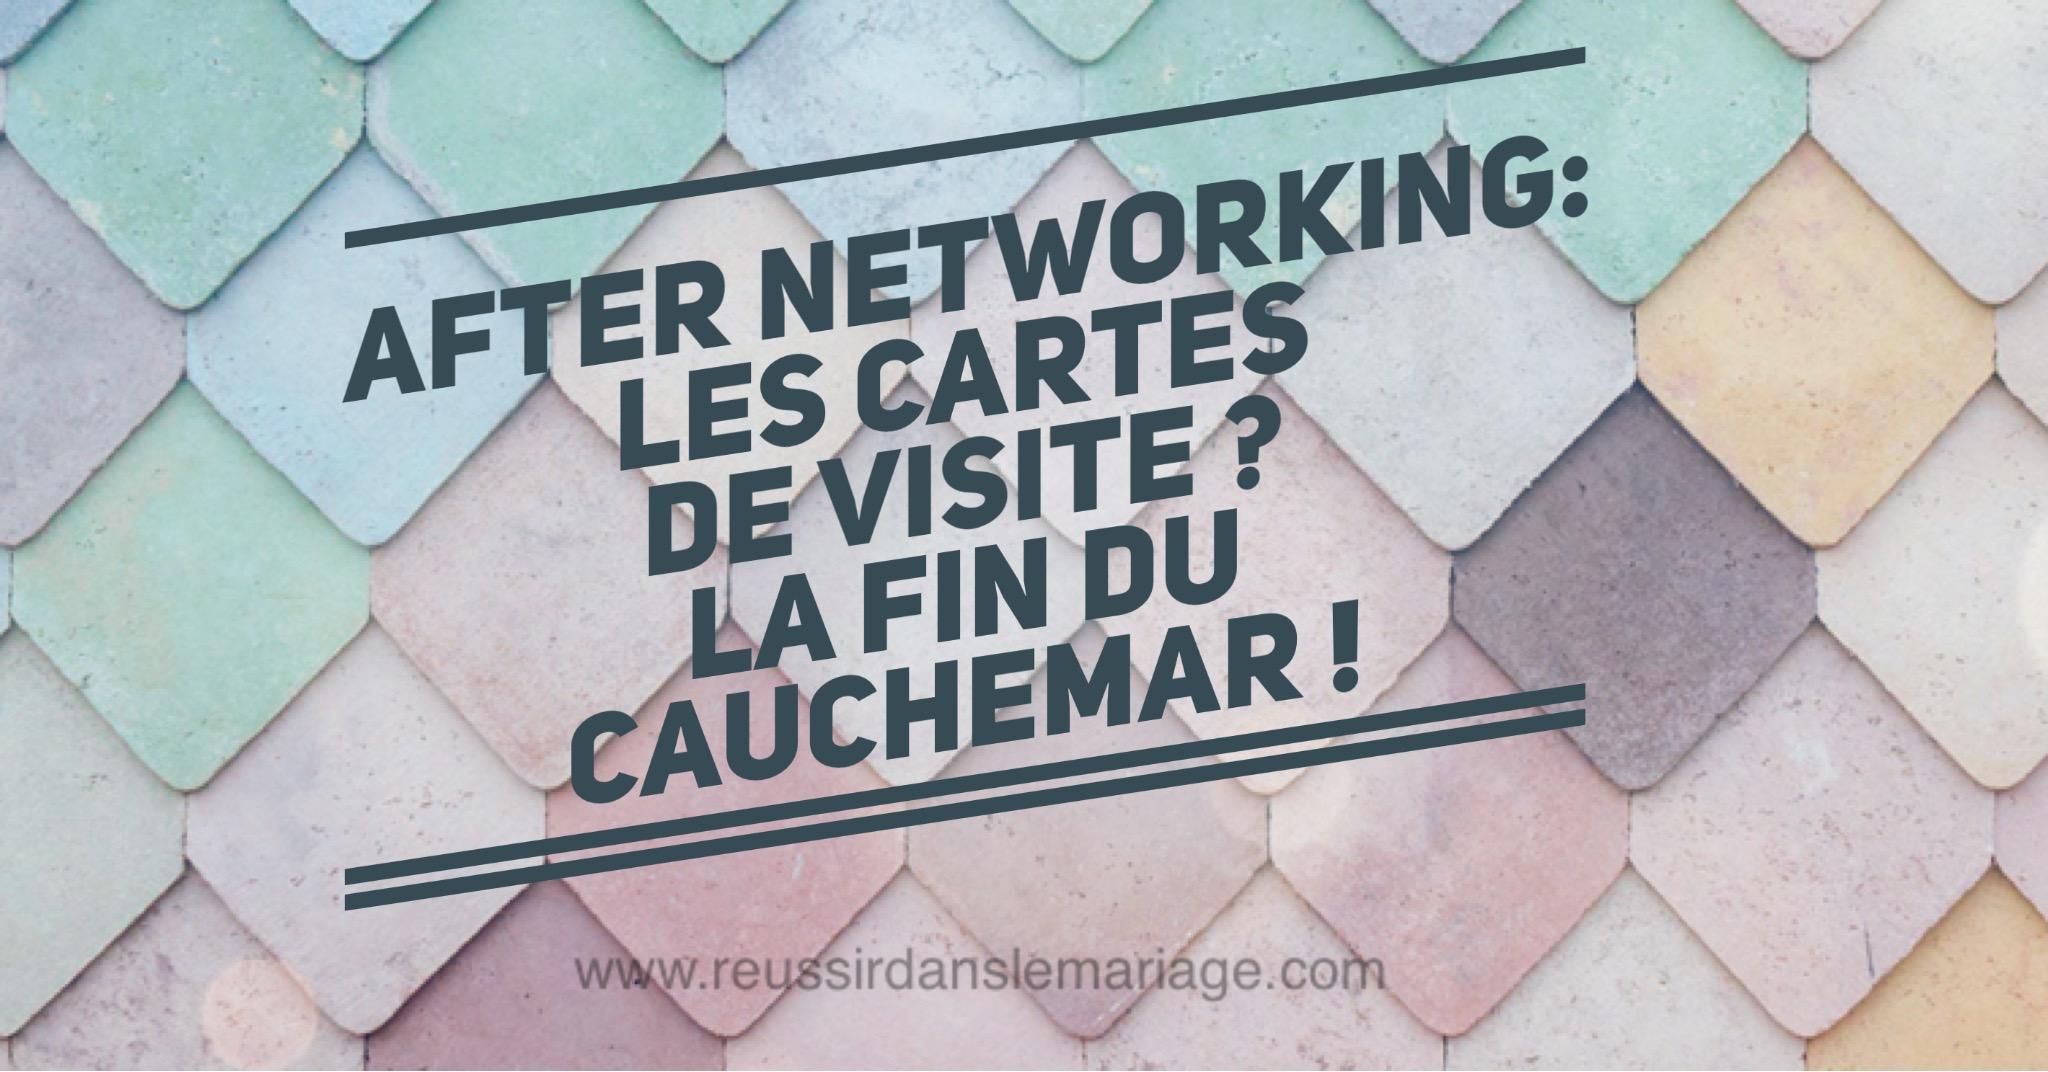 cartes de visites after networking